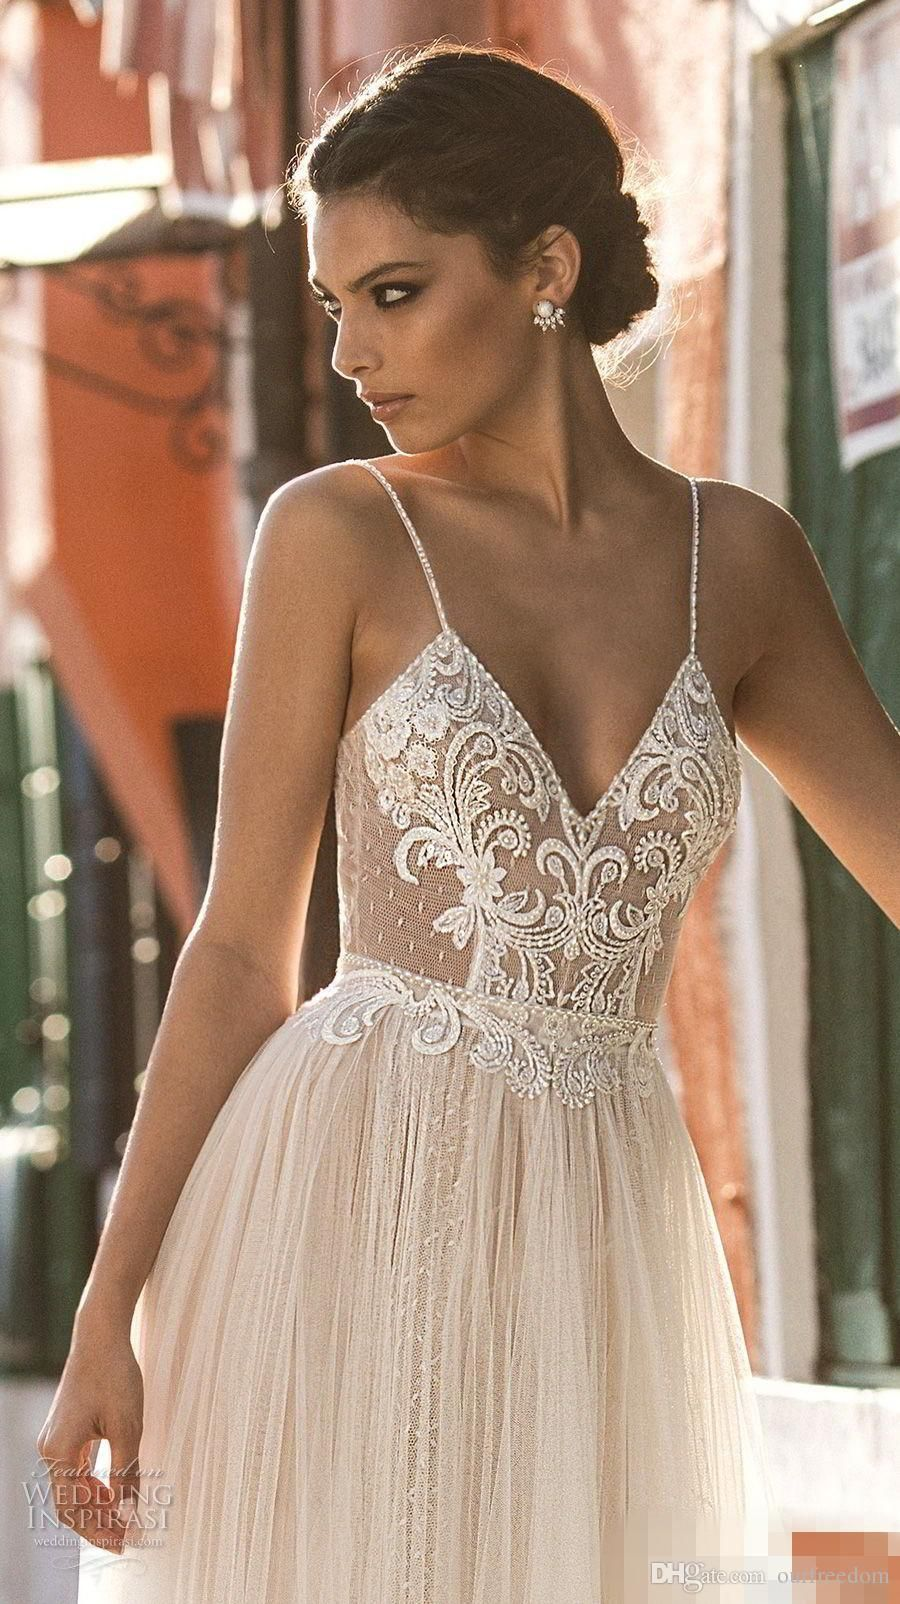 4178a87e69cd7 2018 New Sexy Gali Karten Garden Beach Wedding Dresses Sleeveless Spaghetti  Straps Robe De Soiree Backless Long Boho Brdial Gowns